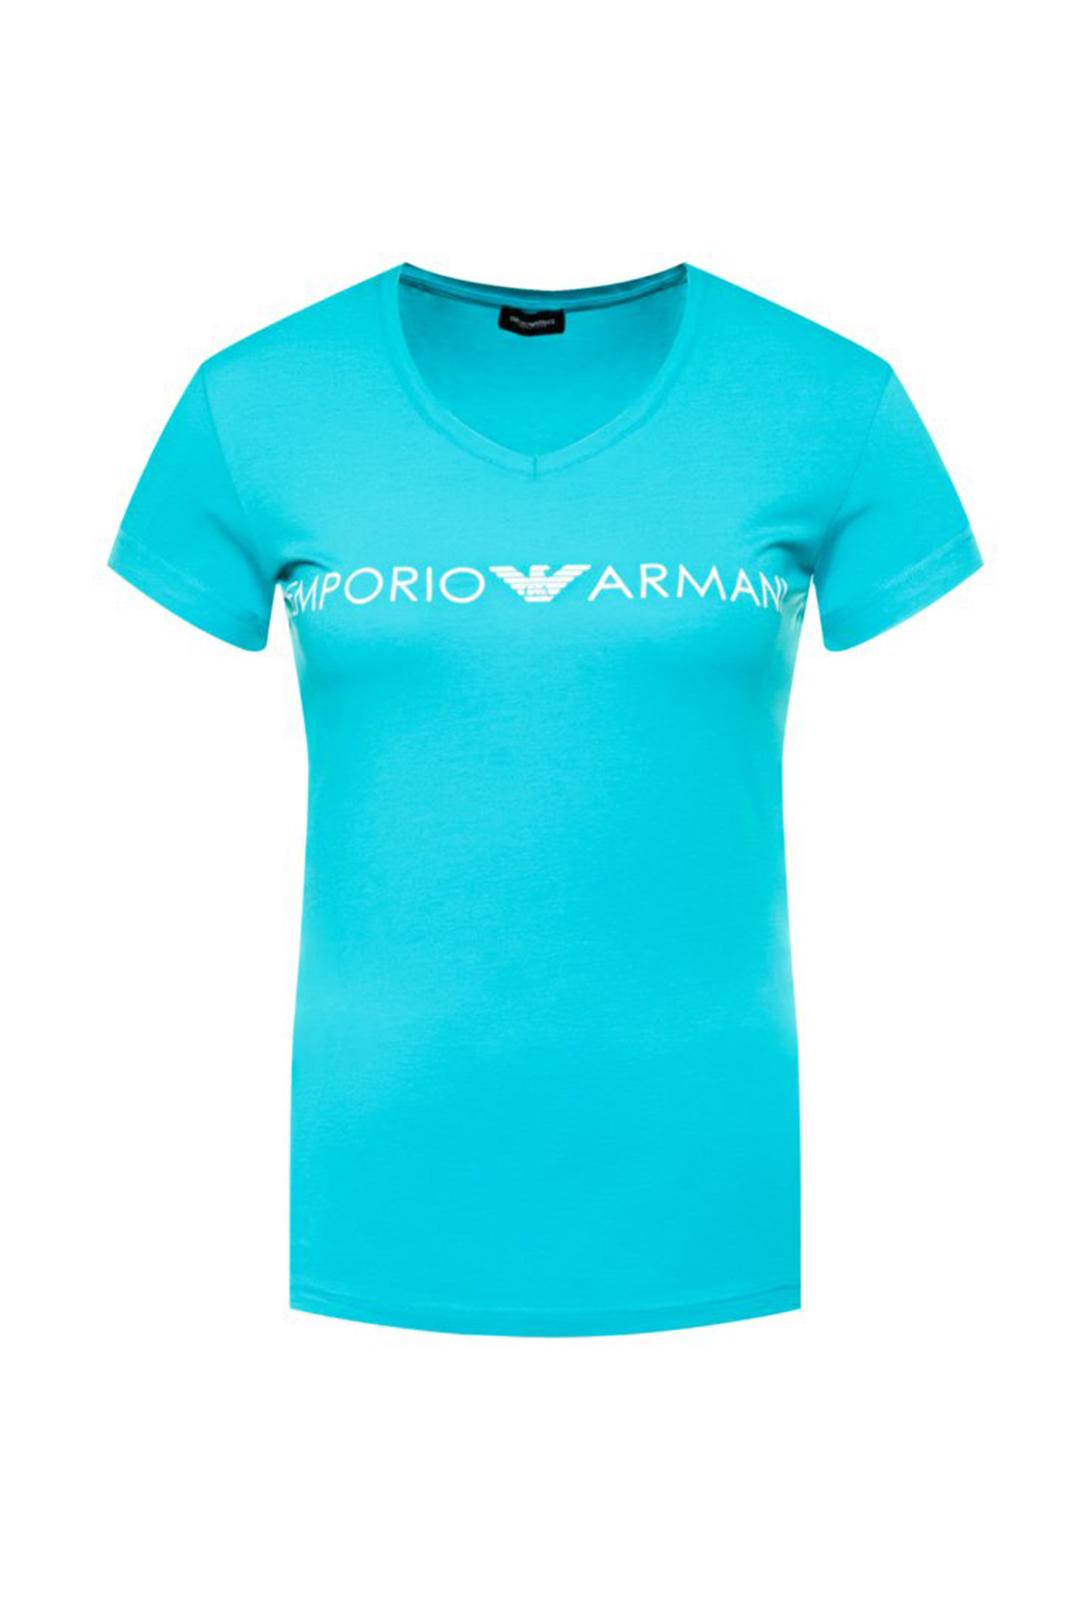 Tee shirt  Emporio armani 163321 0P317 00383 WATER GREEN